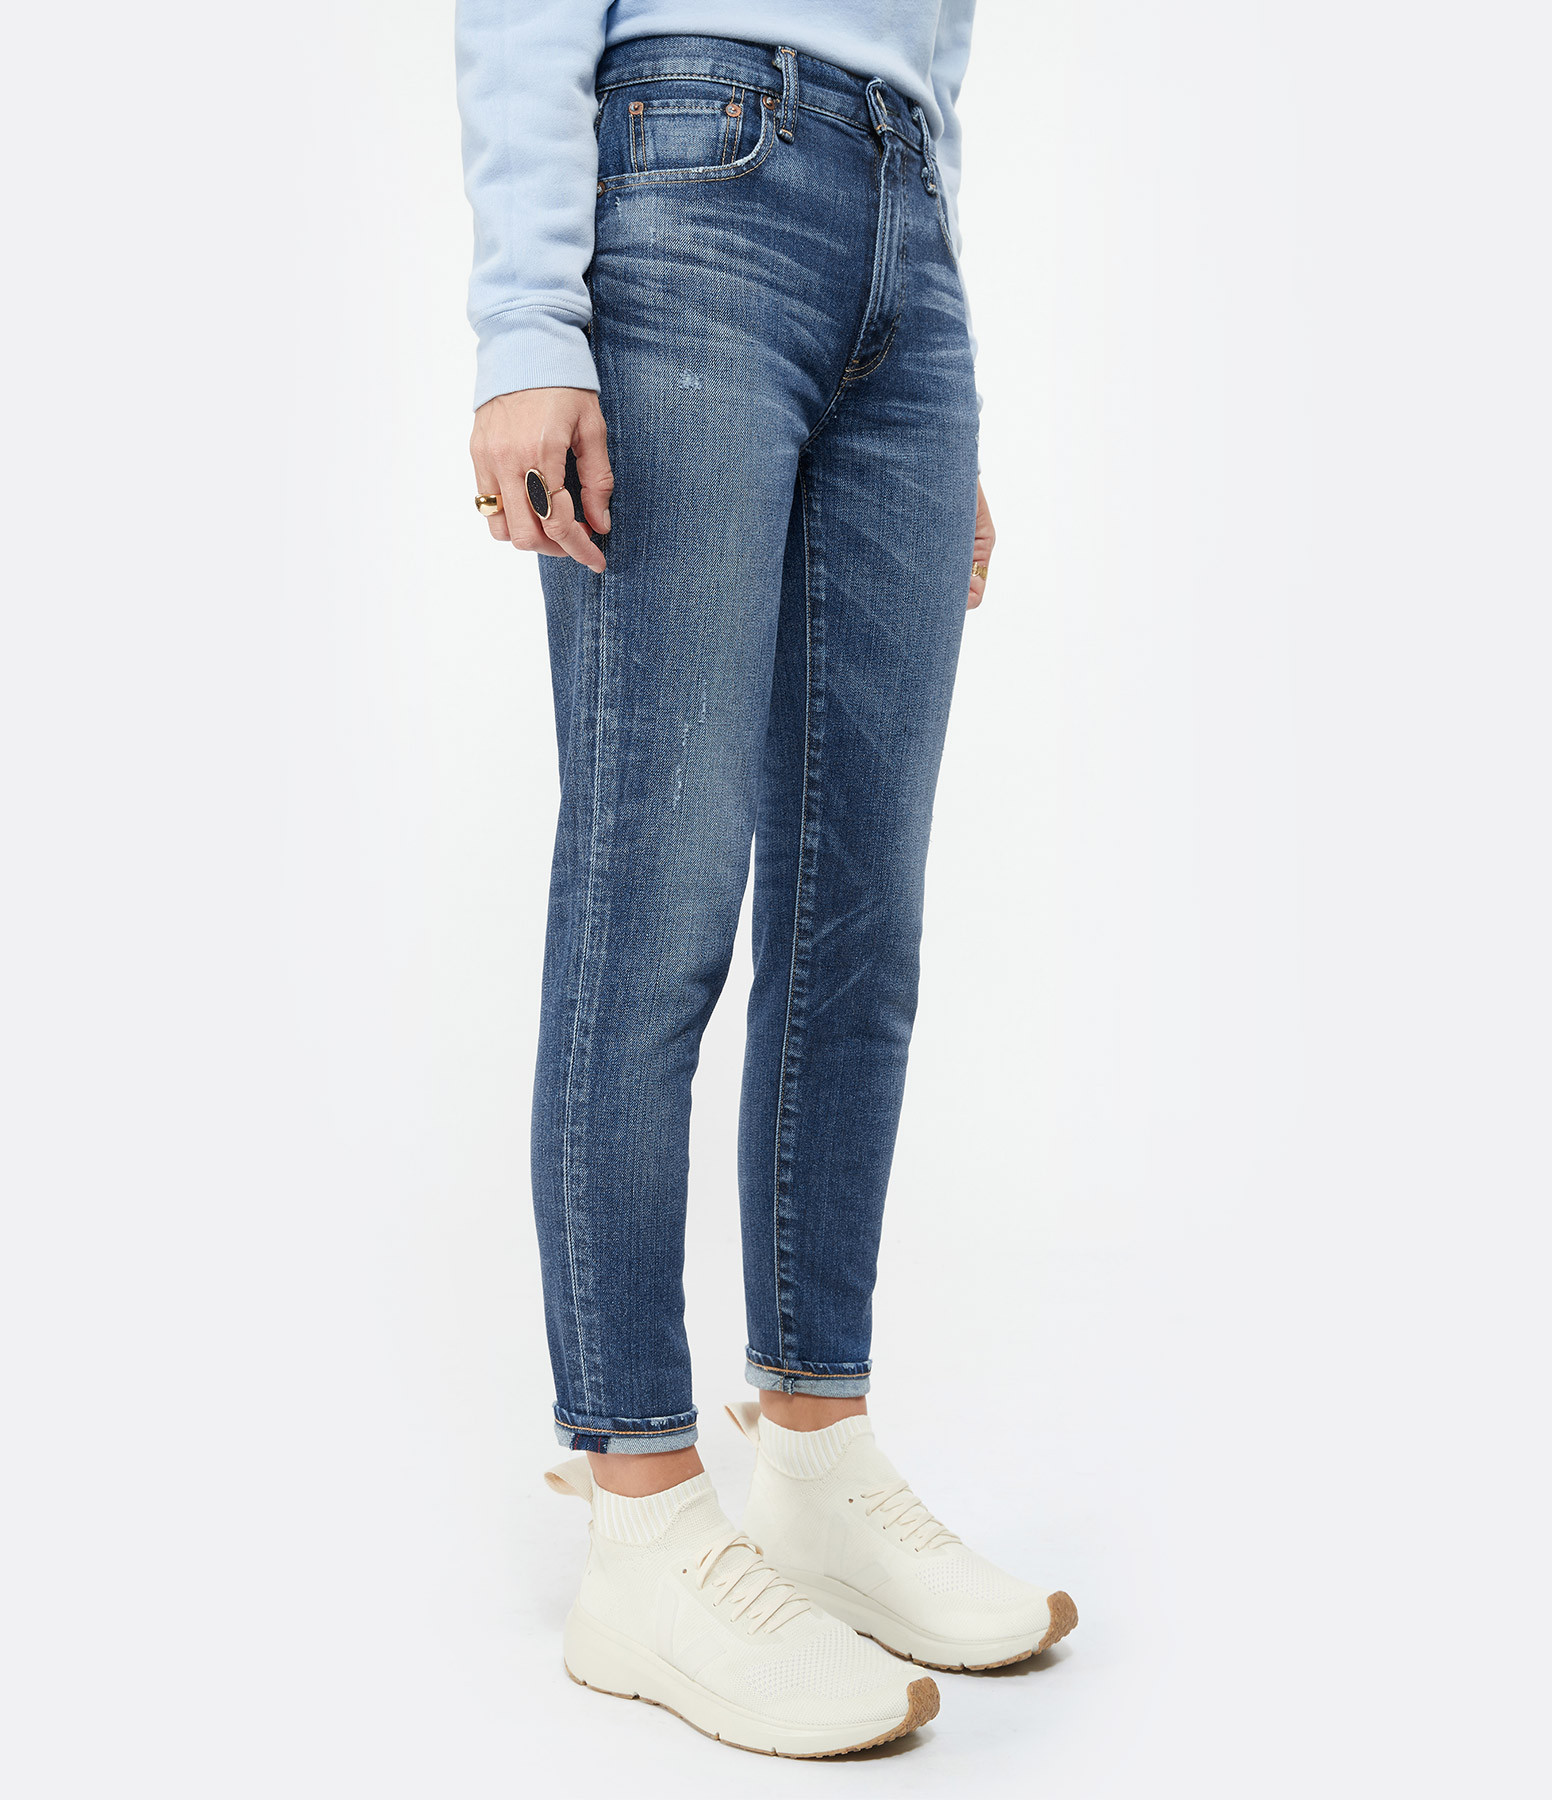 MOUSSY VINTAGE - Jean Tamworth Skinny Coton Denim Bleu